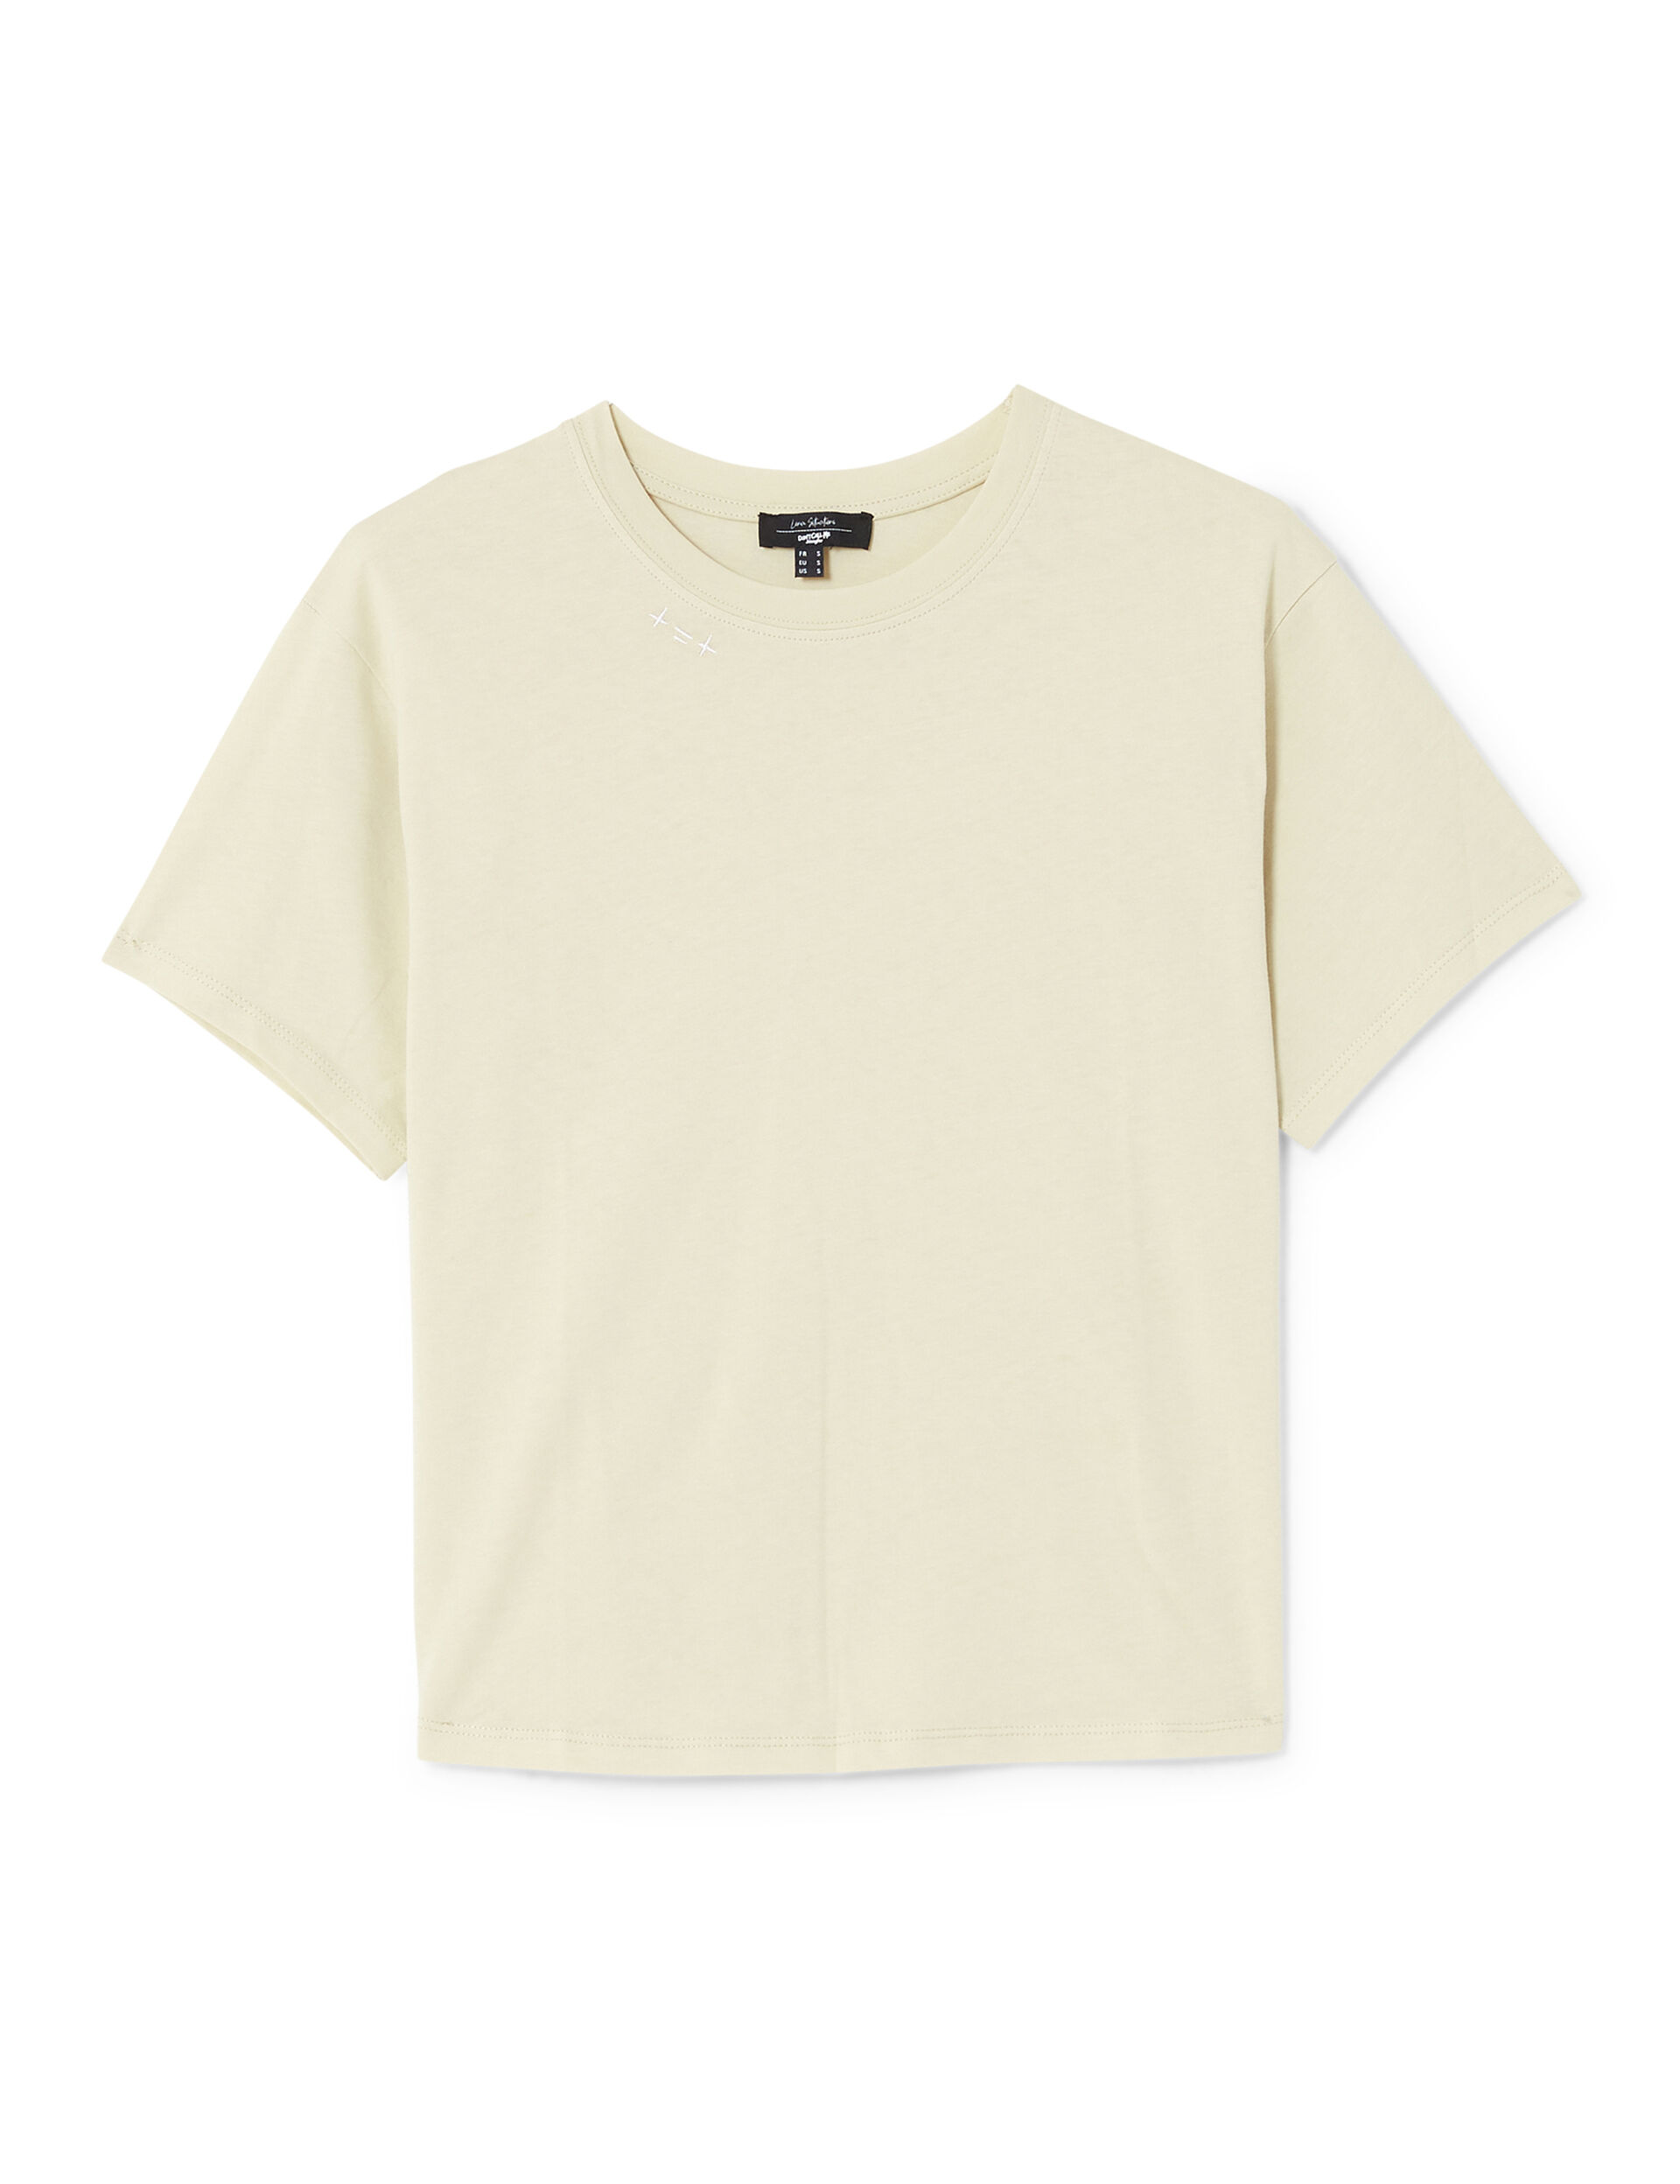 Always More T-shirt